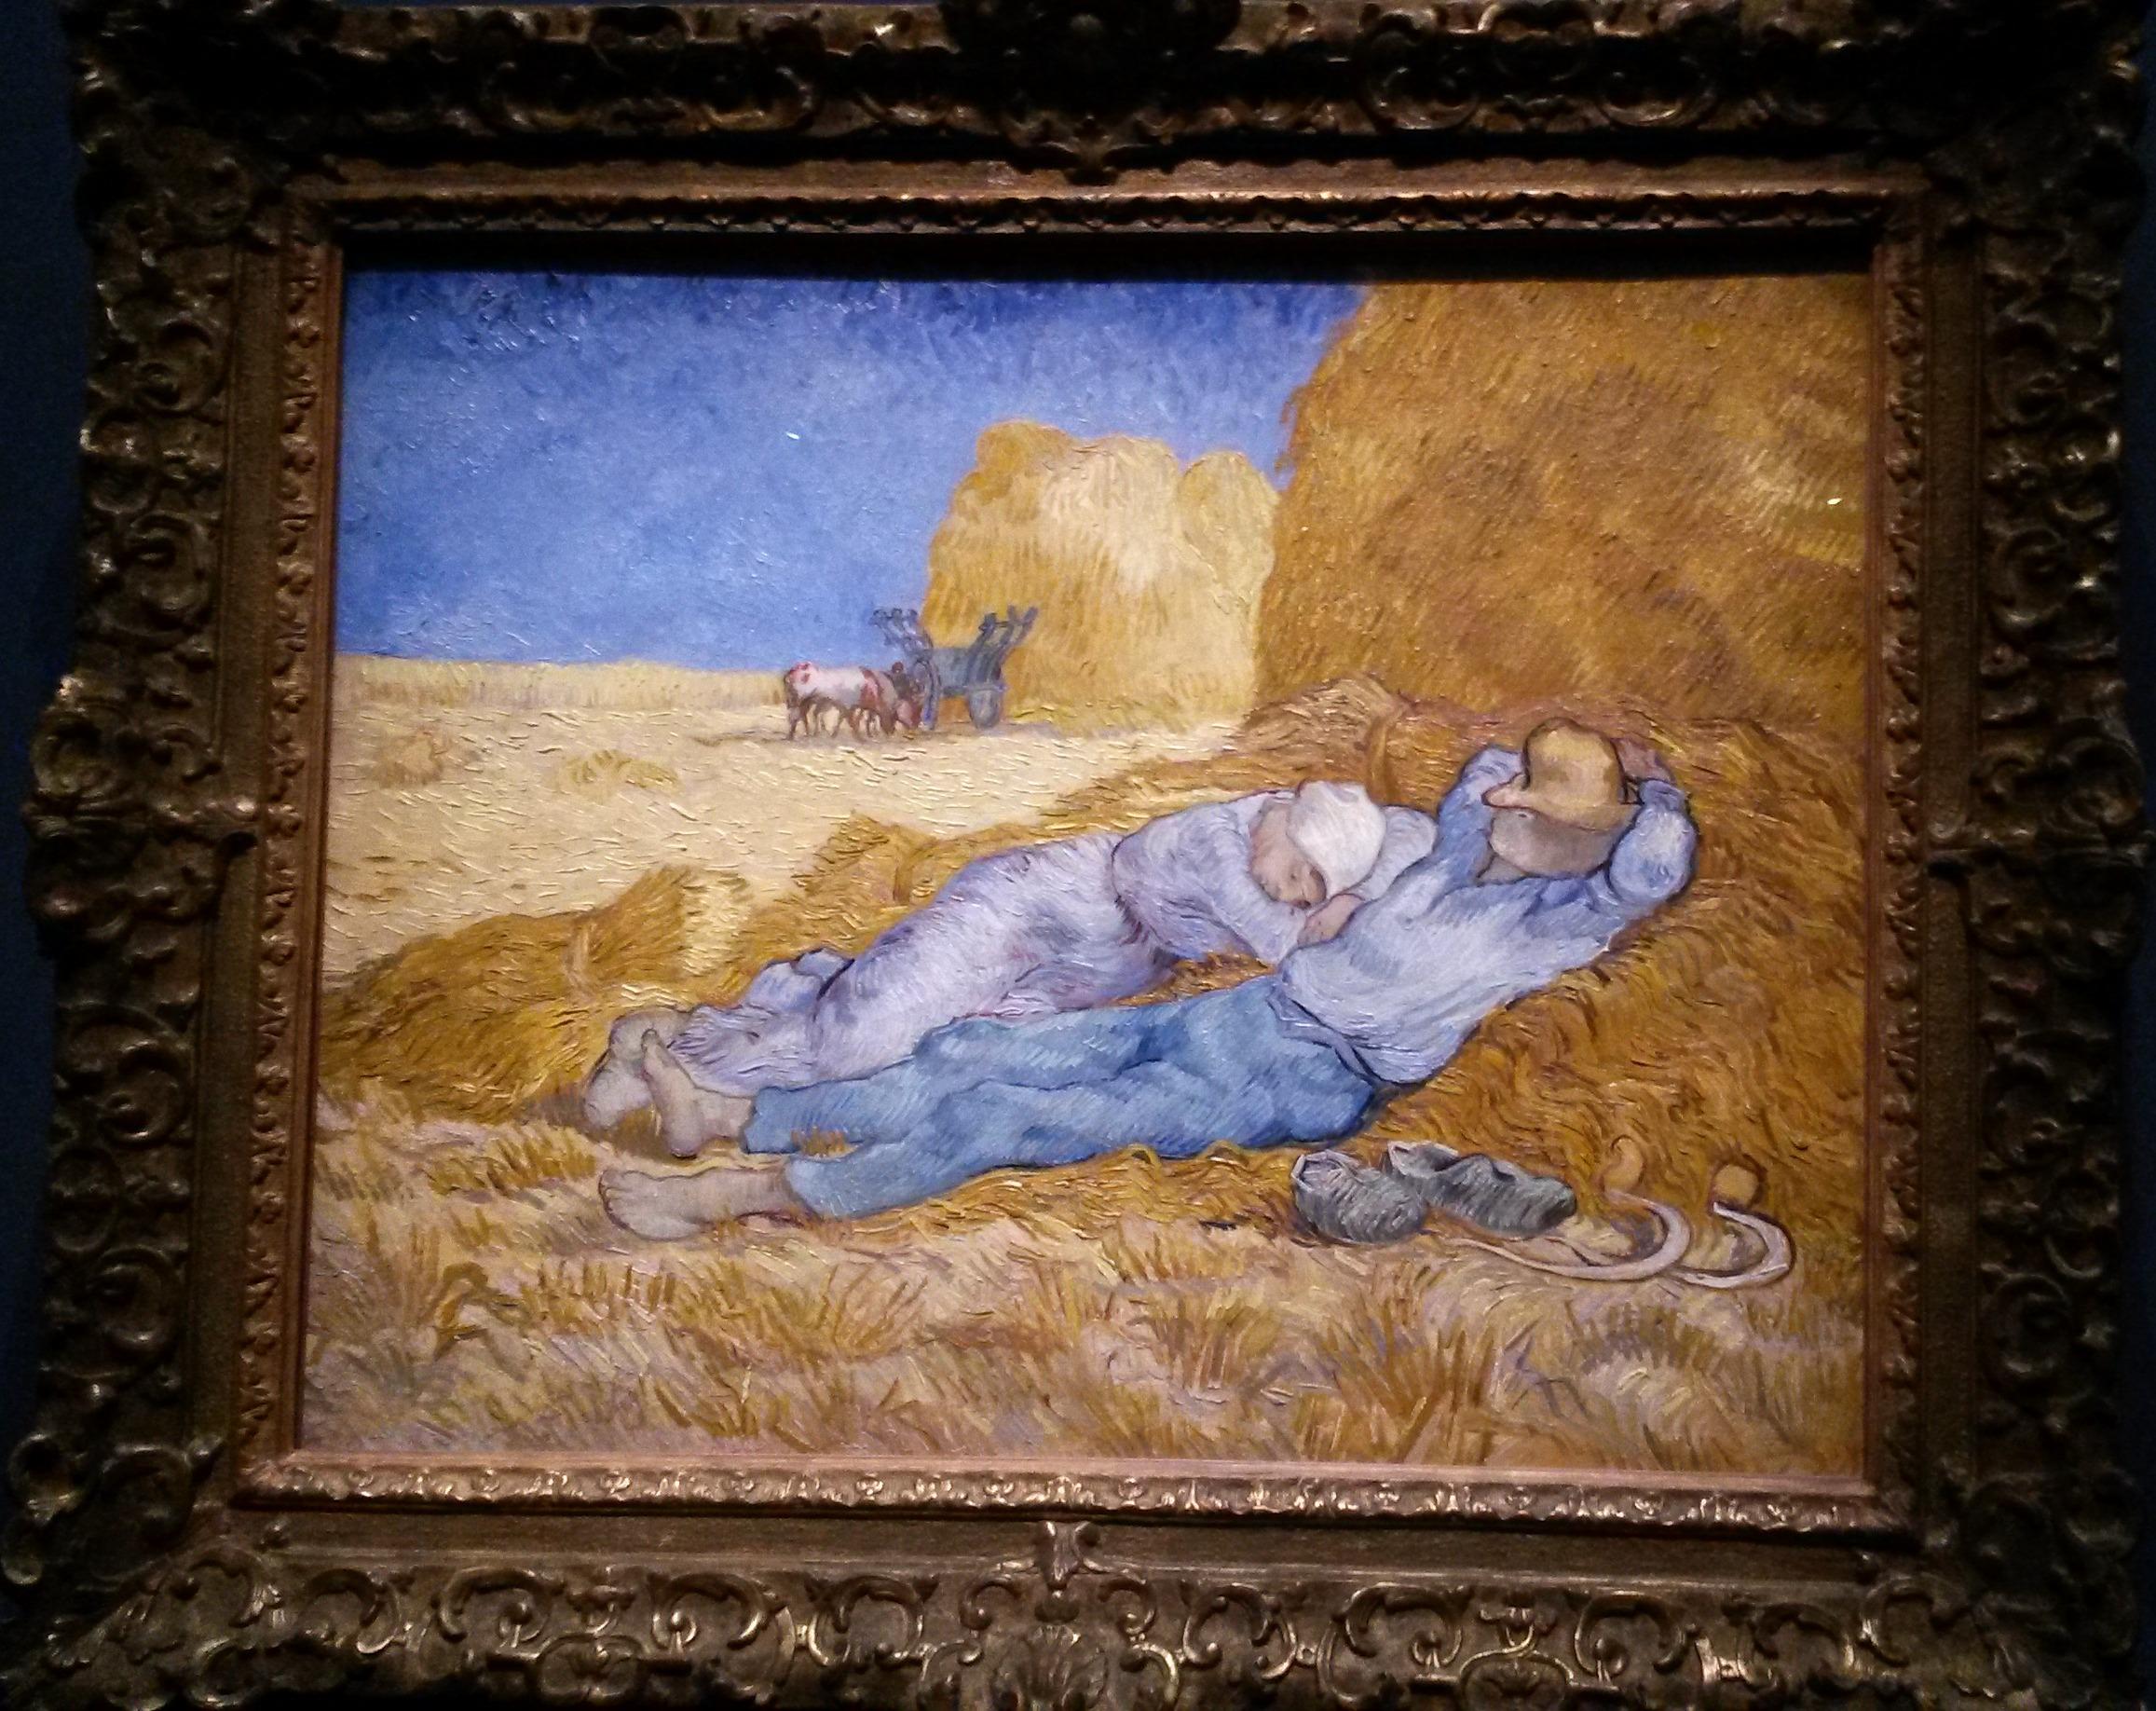 The siesta